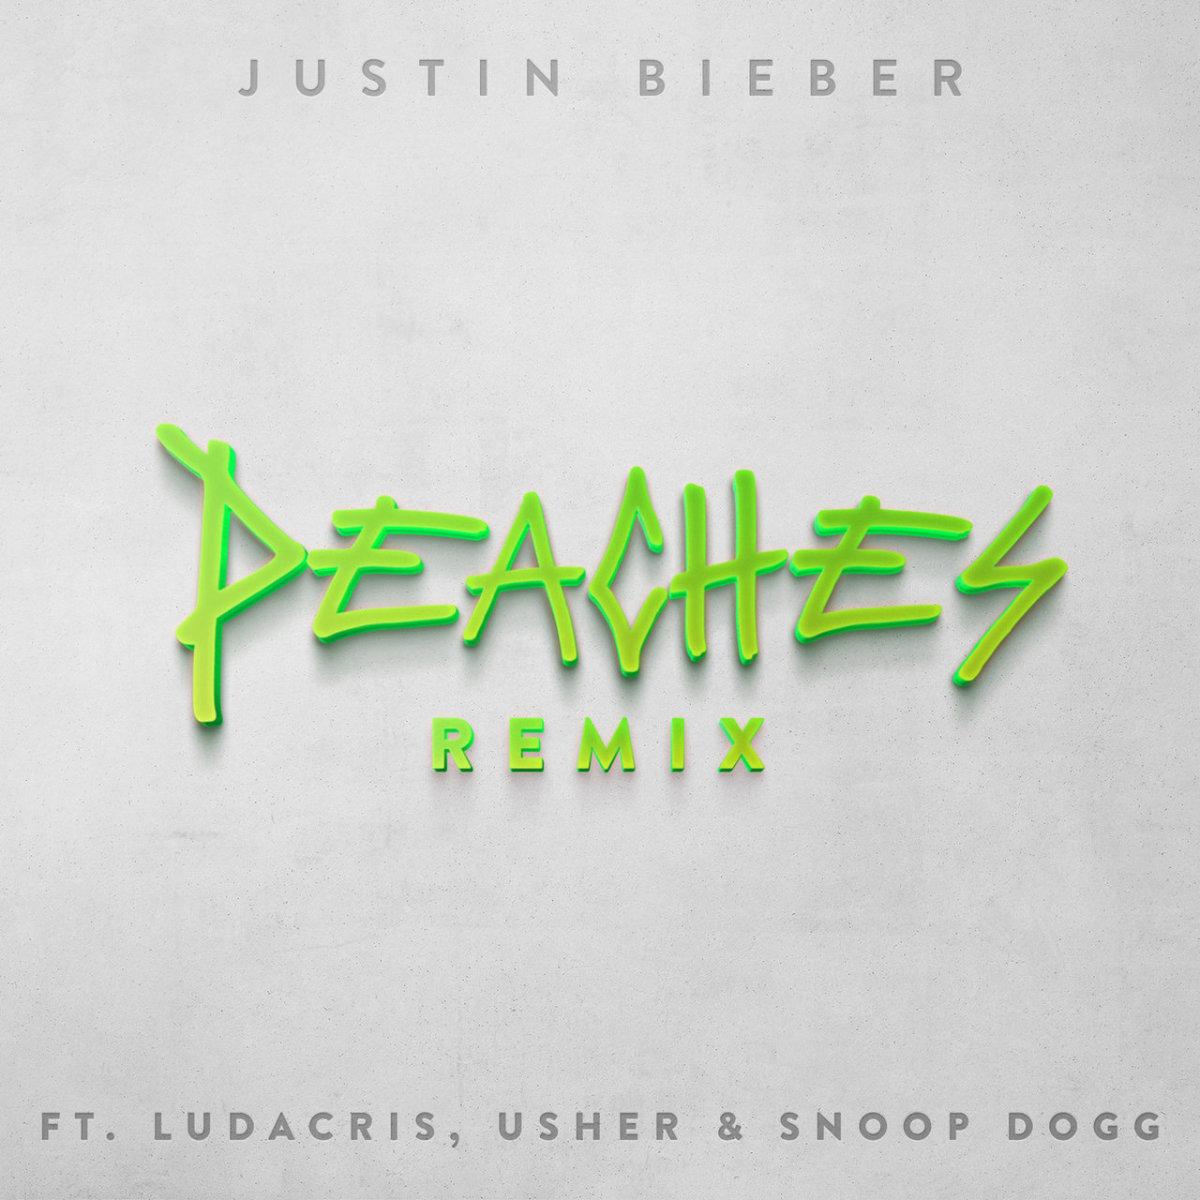 Justin Bieber - Peaches (Remix) ft. Ludacris, Usher & Snoop Dogg